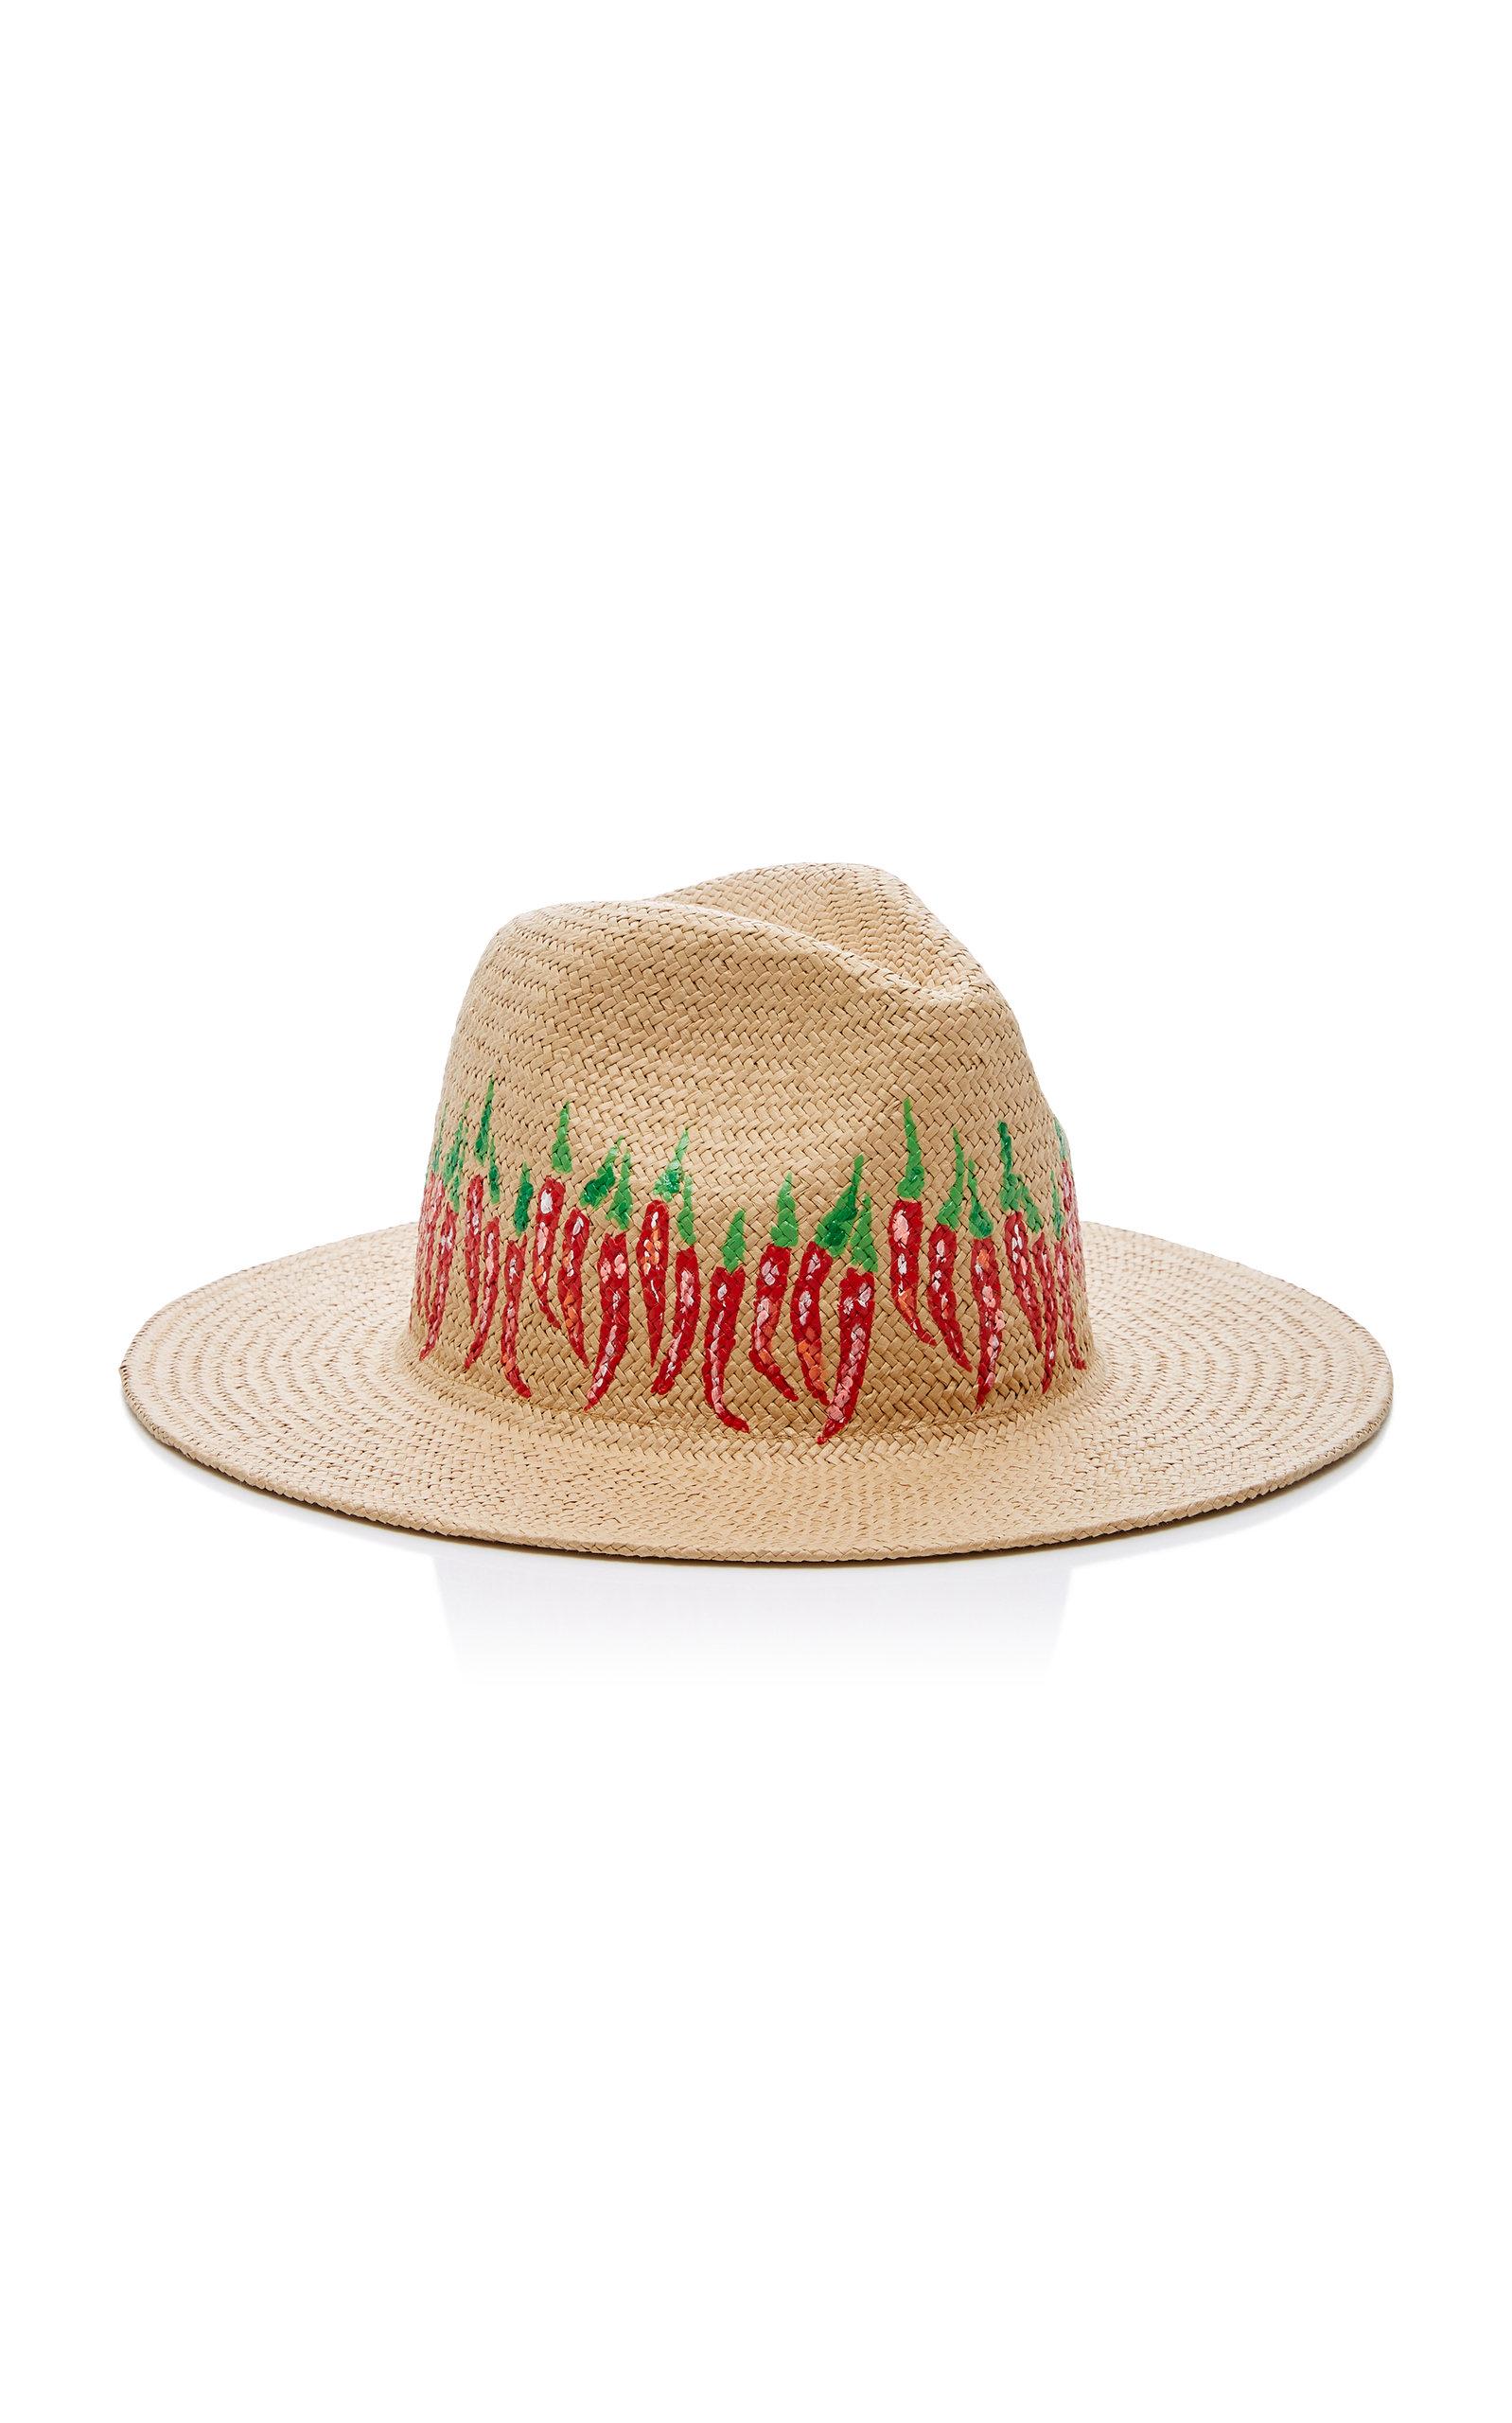 Rosa Panama Hat Onia AvX3LtP